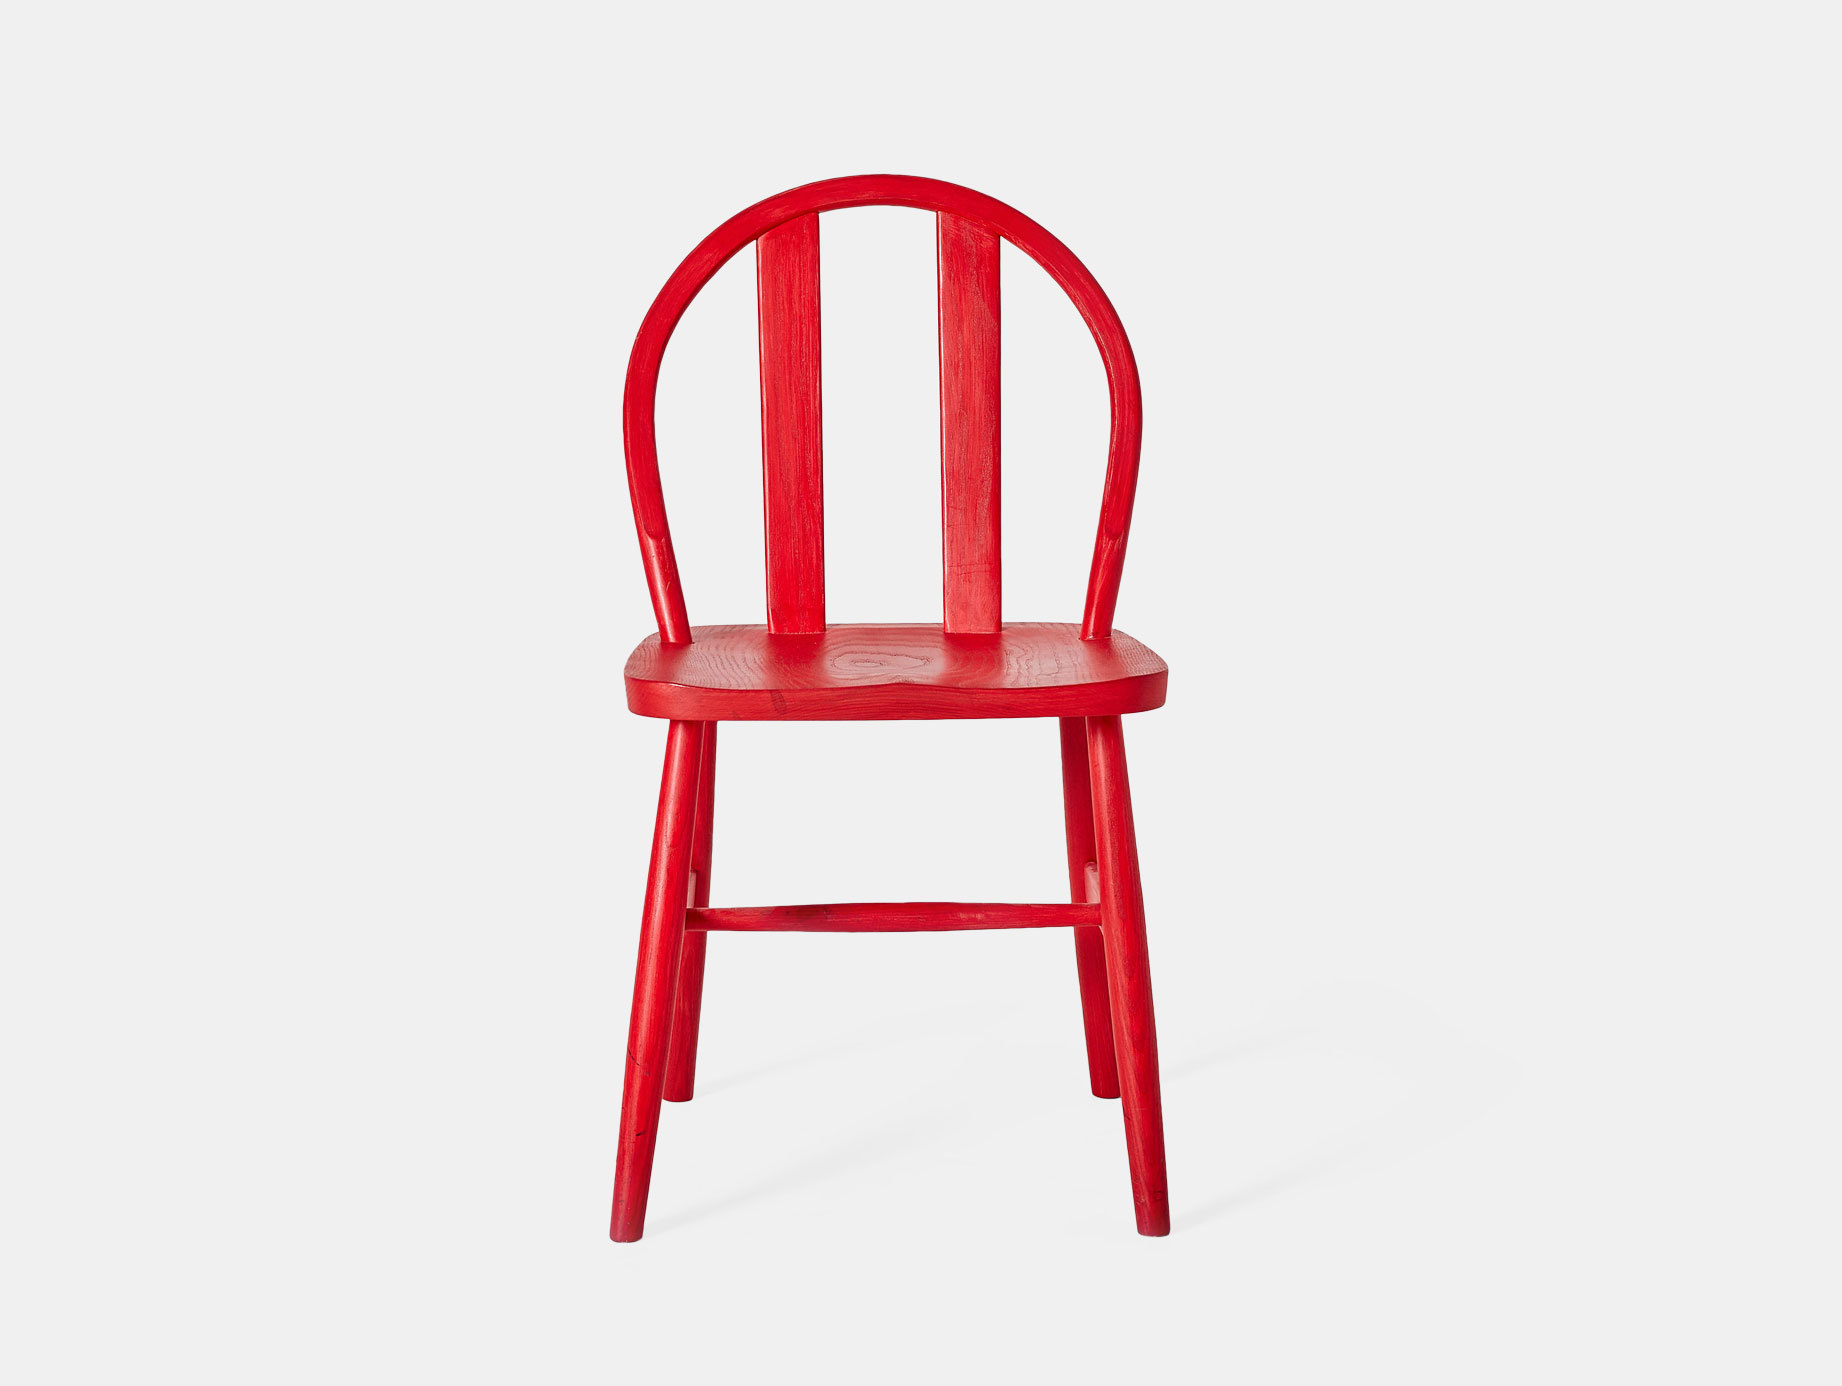 Bird Chair image 3